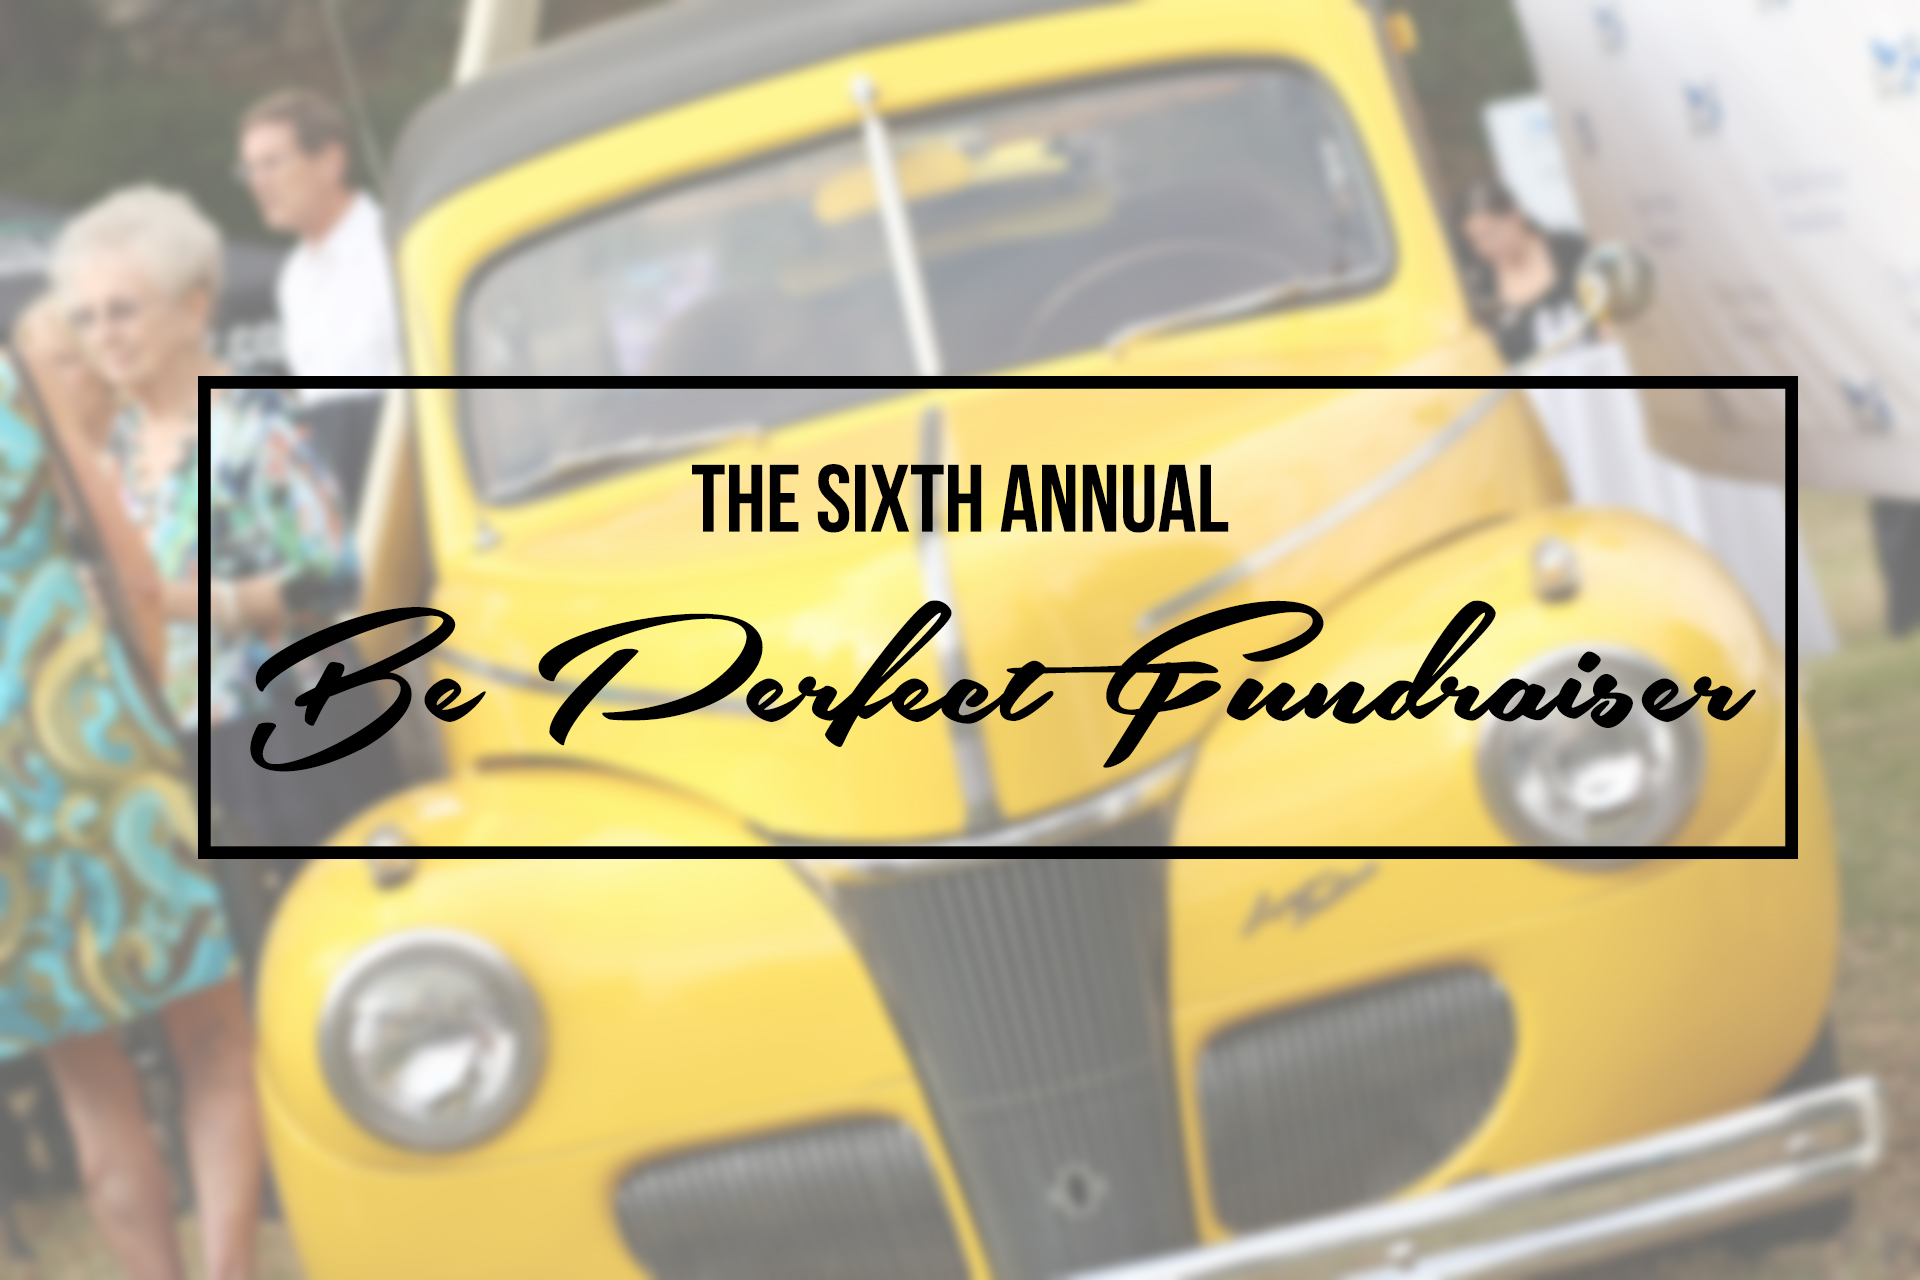 AnnualFundraiser_6th_-0.jpg